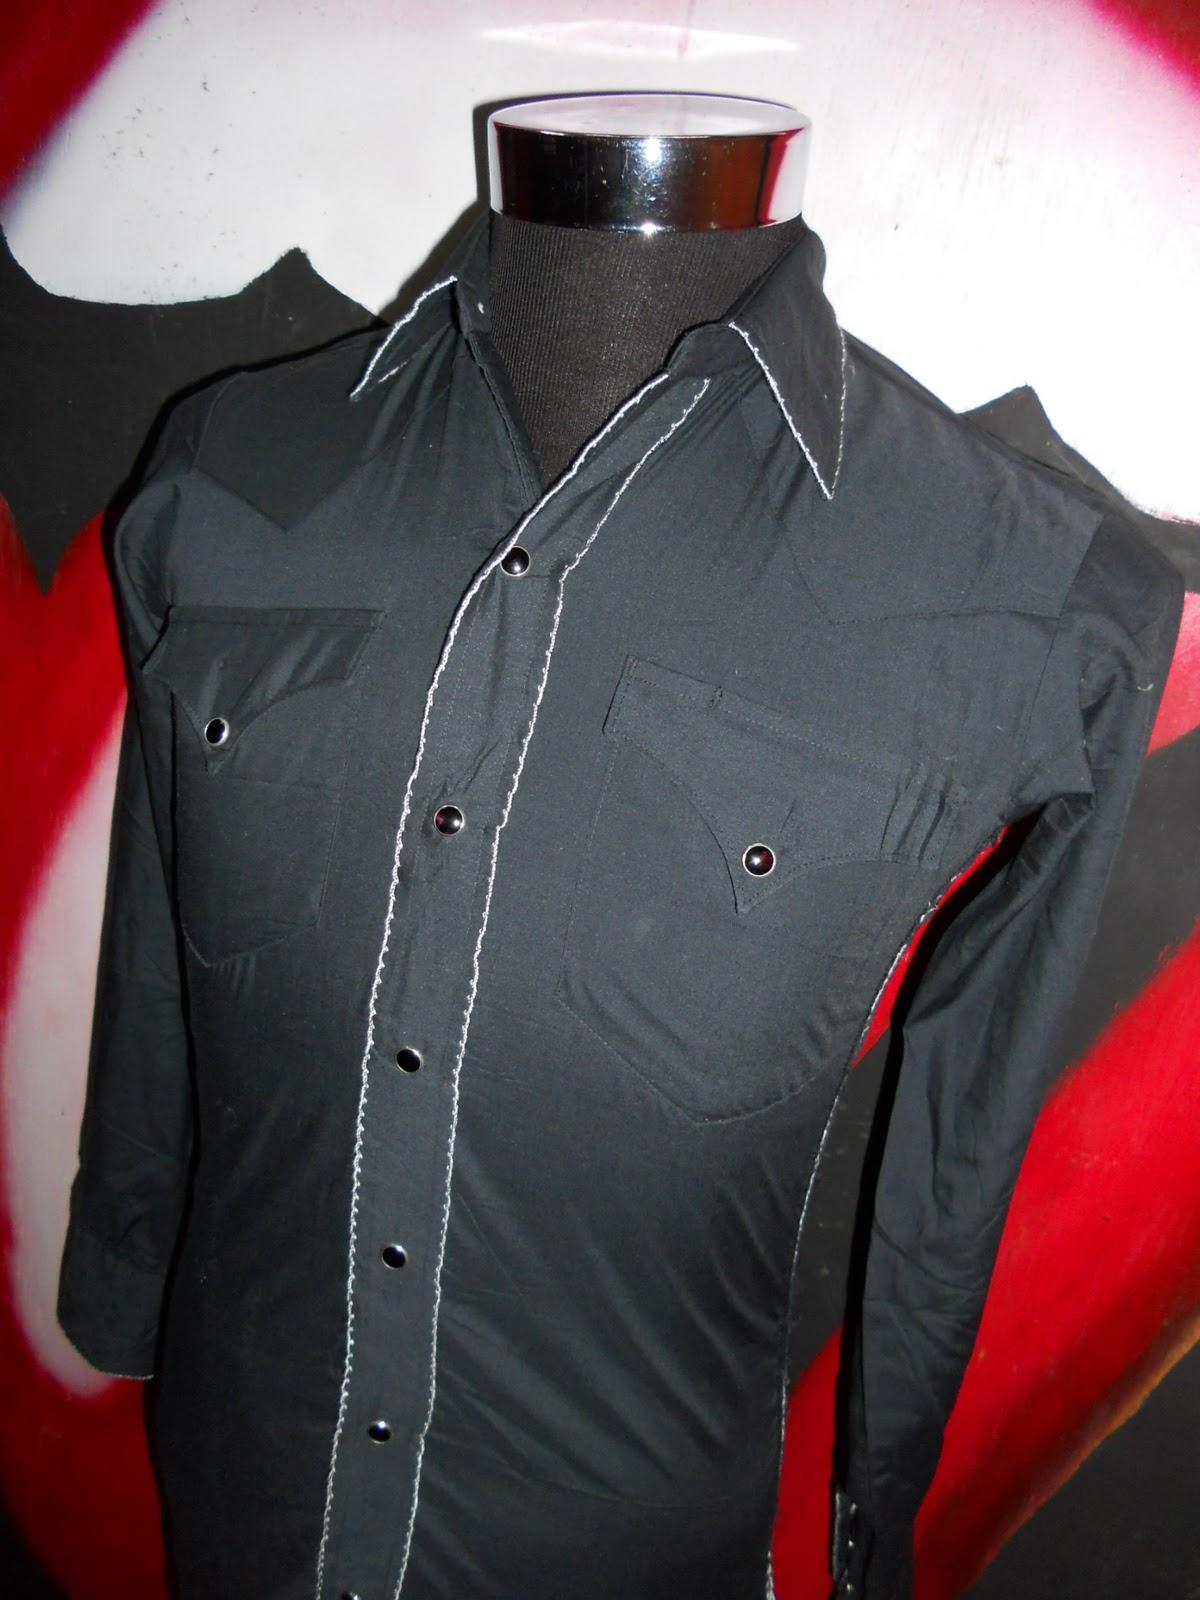 Gudang Fashion Cotton Vest Mens Hitam Daftar Harga Terbaru Dan Jas Semi Formal Pria Stretch Grey Blz 723 Condition A Size Sarmpit 175length 31 Rm 70sold